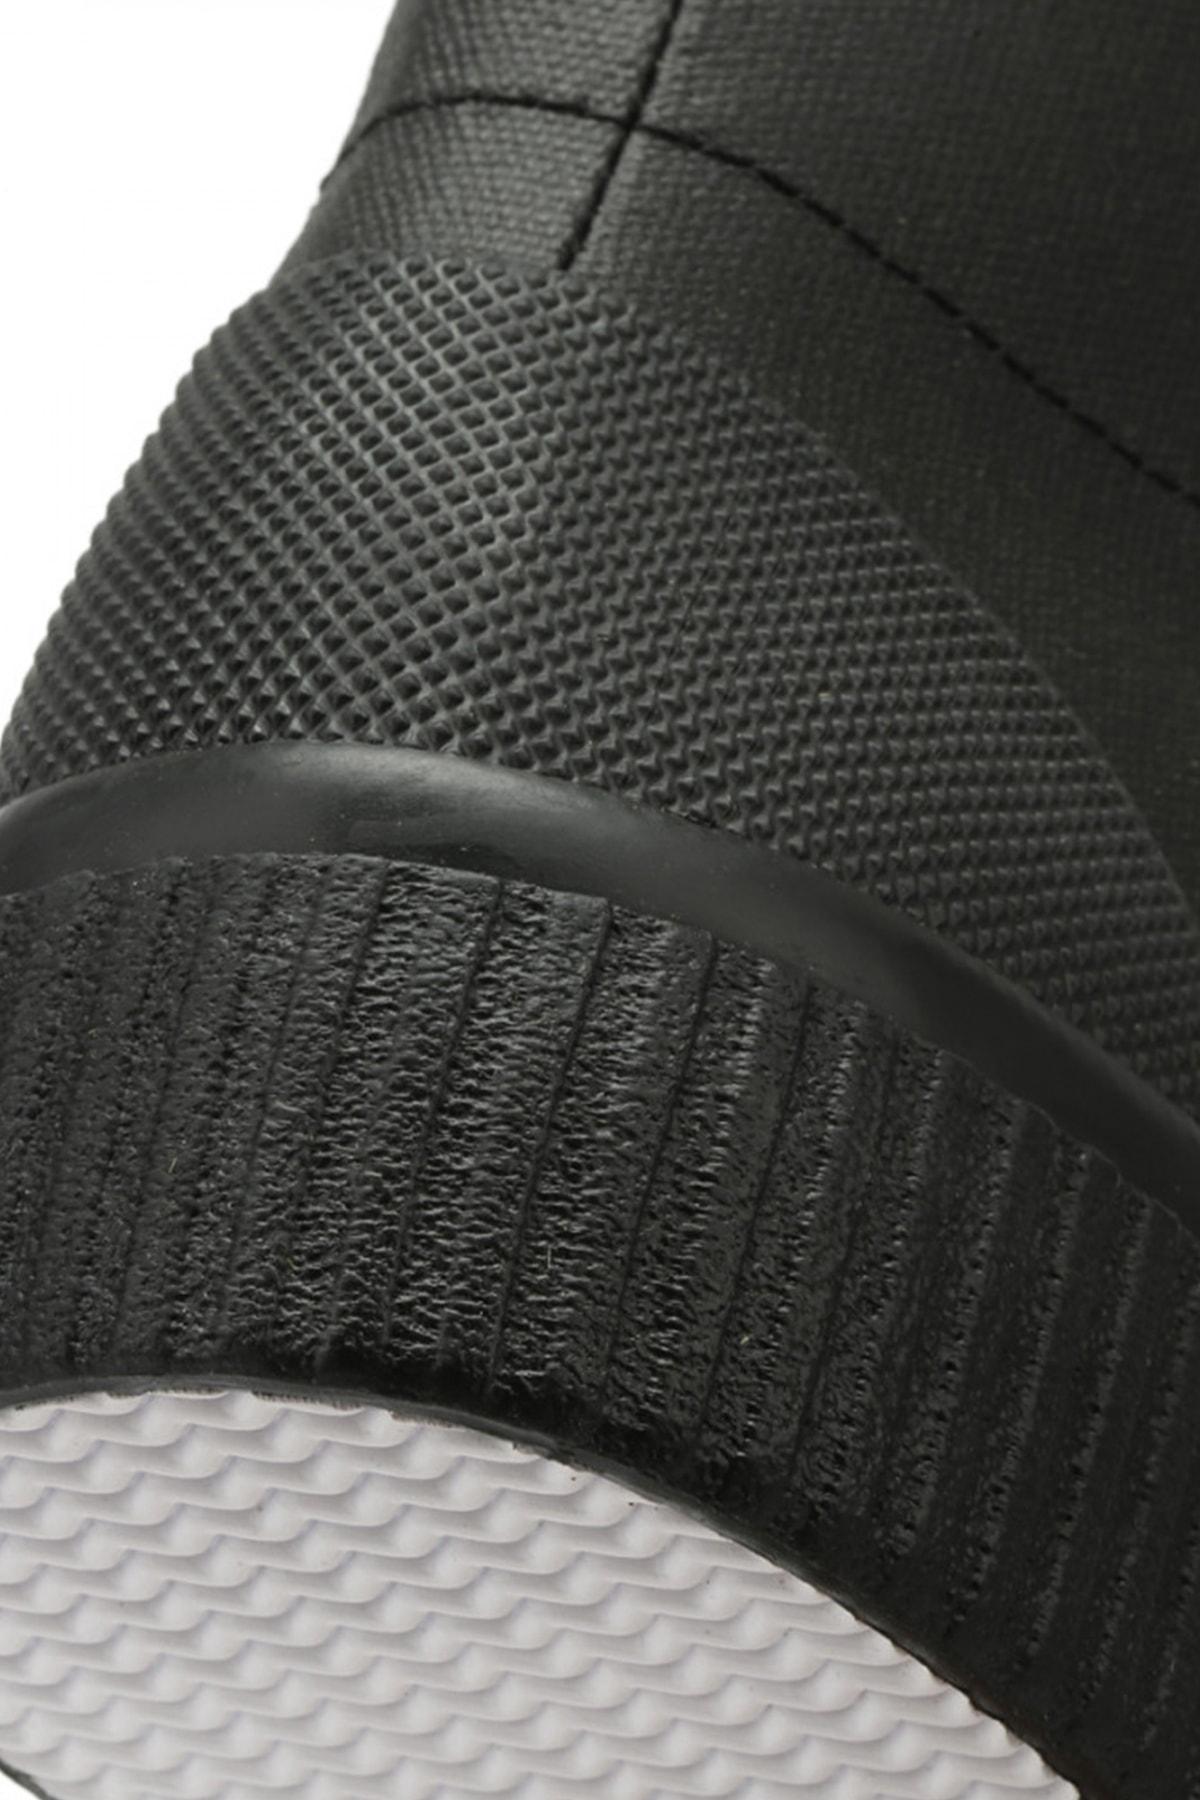 Fred Perry Kadın Siyah Sneaker 183FRPKAYB4330_F102 2